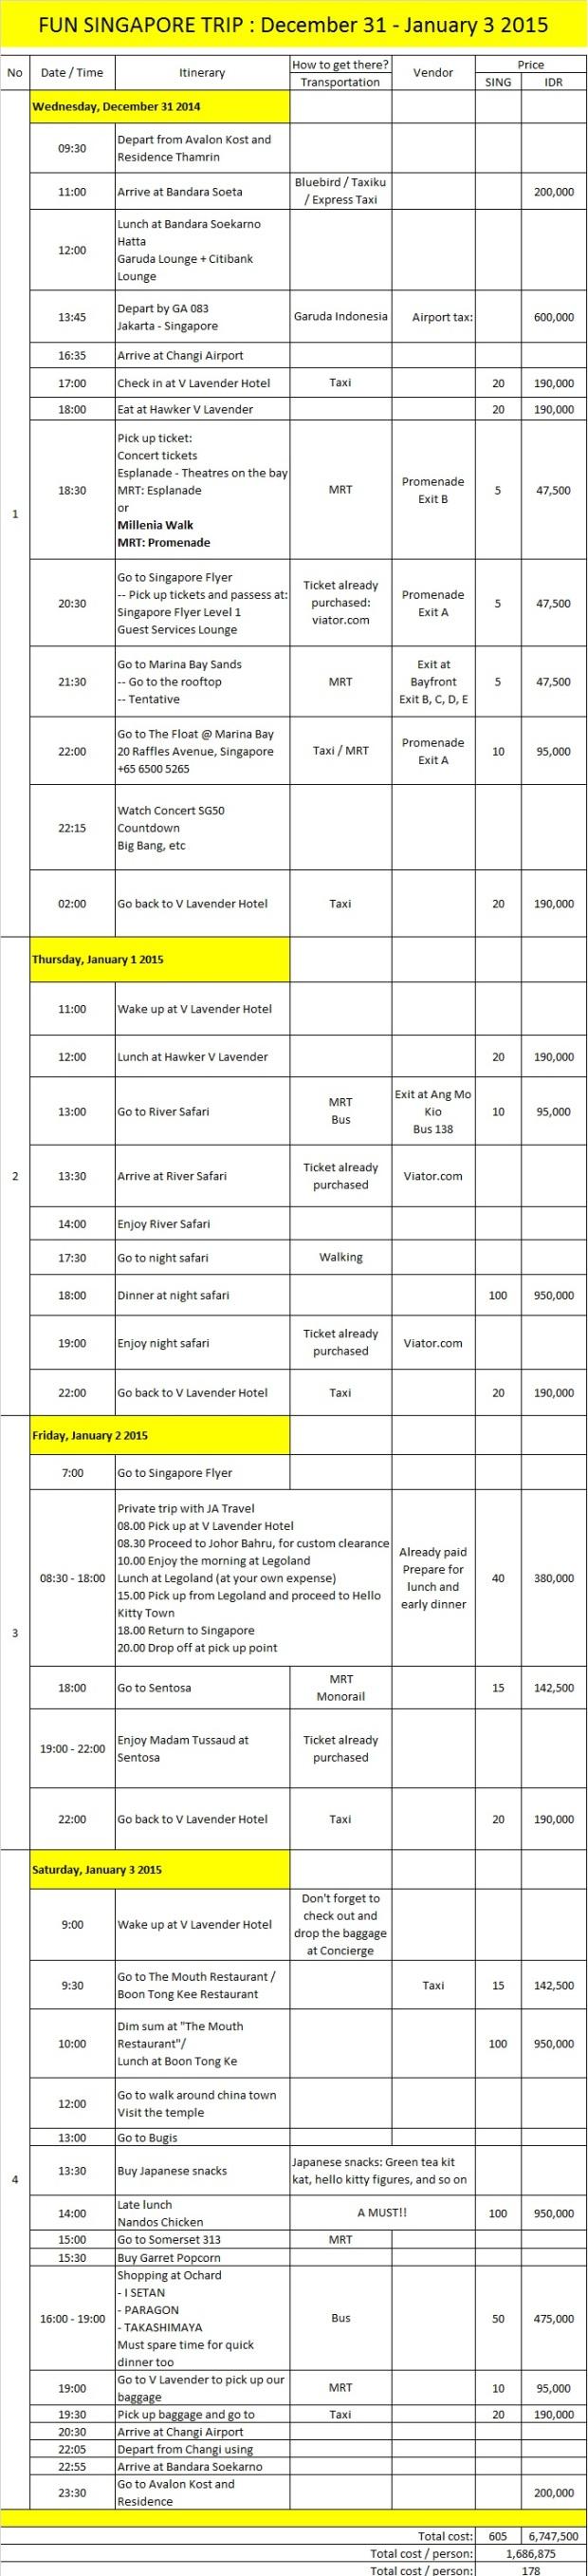 Itinerary Singapore Dec 31 - Jan 3